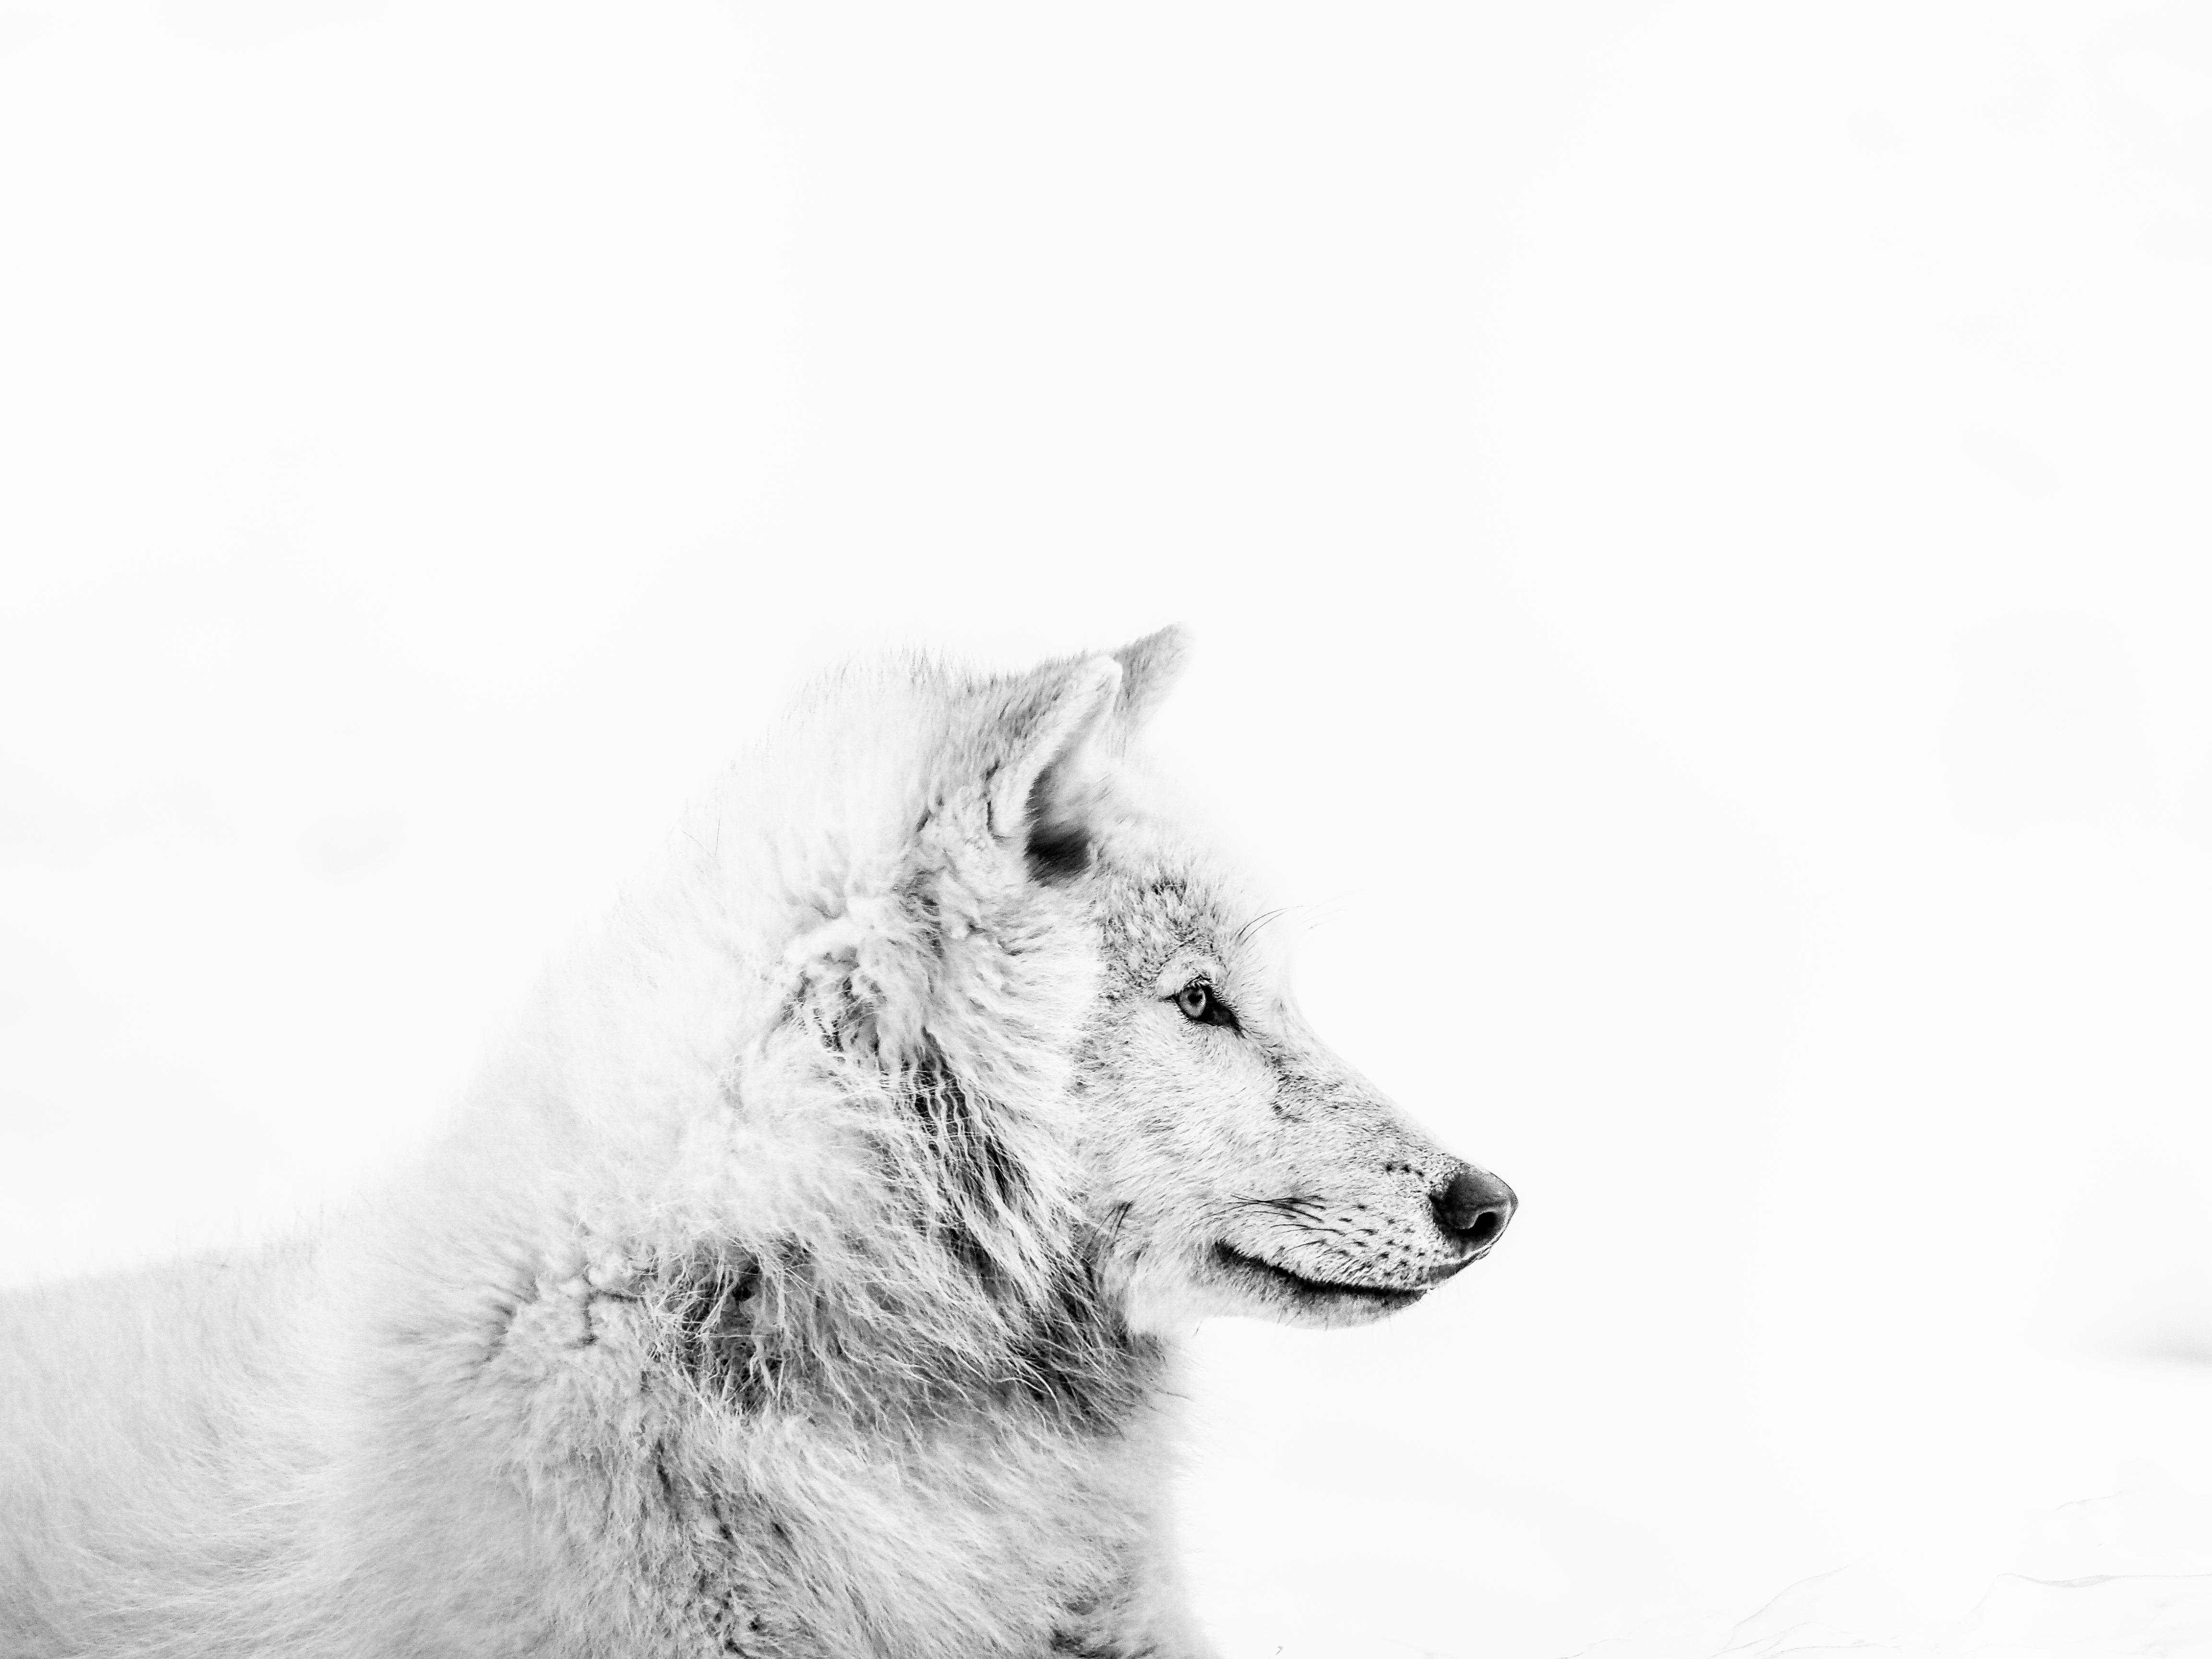 Loup_IMG_046_Hope